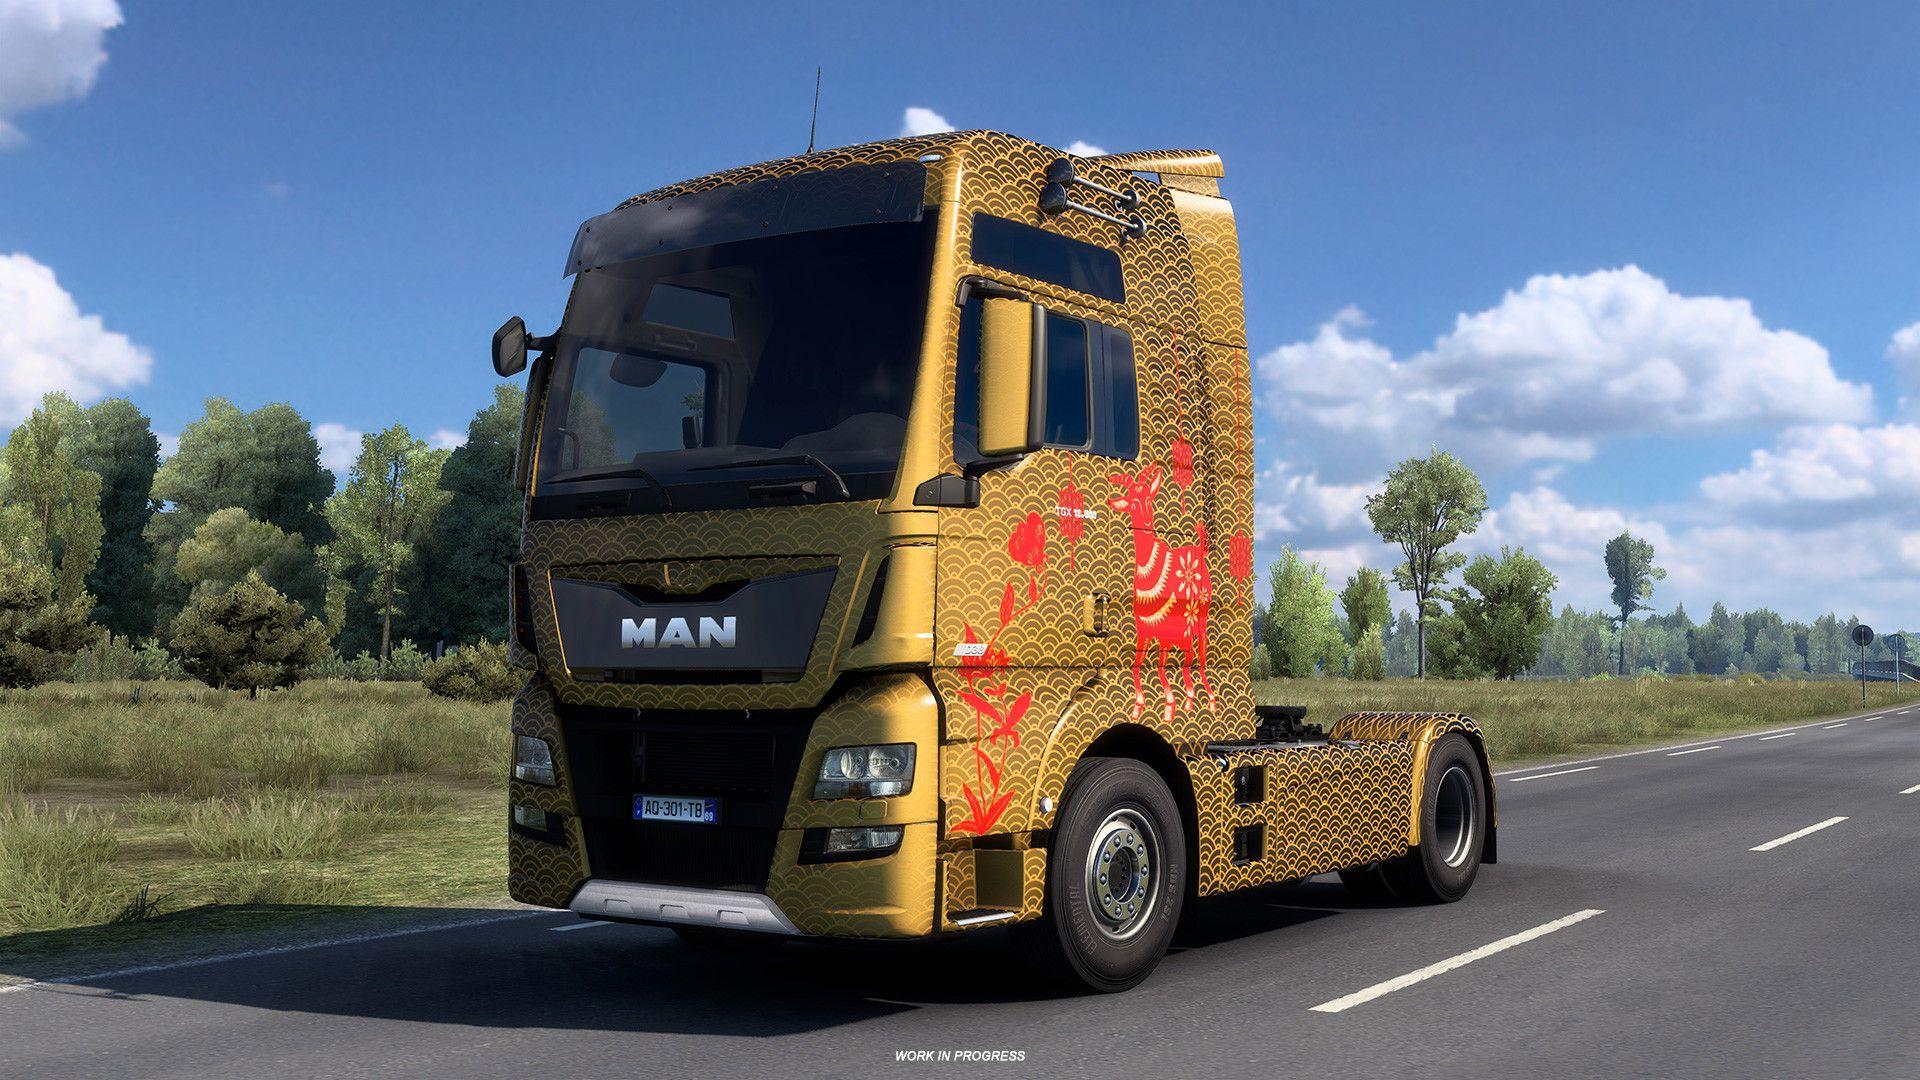 Euro Truck Simulator 2 - Lunar New Year Pack